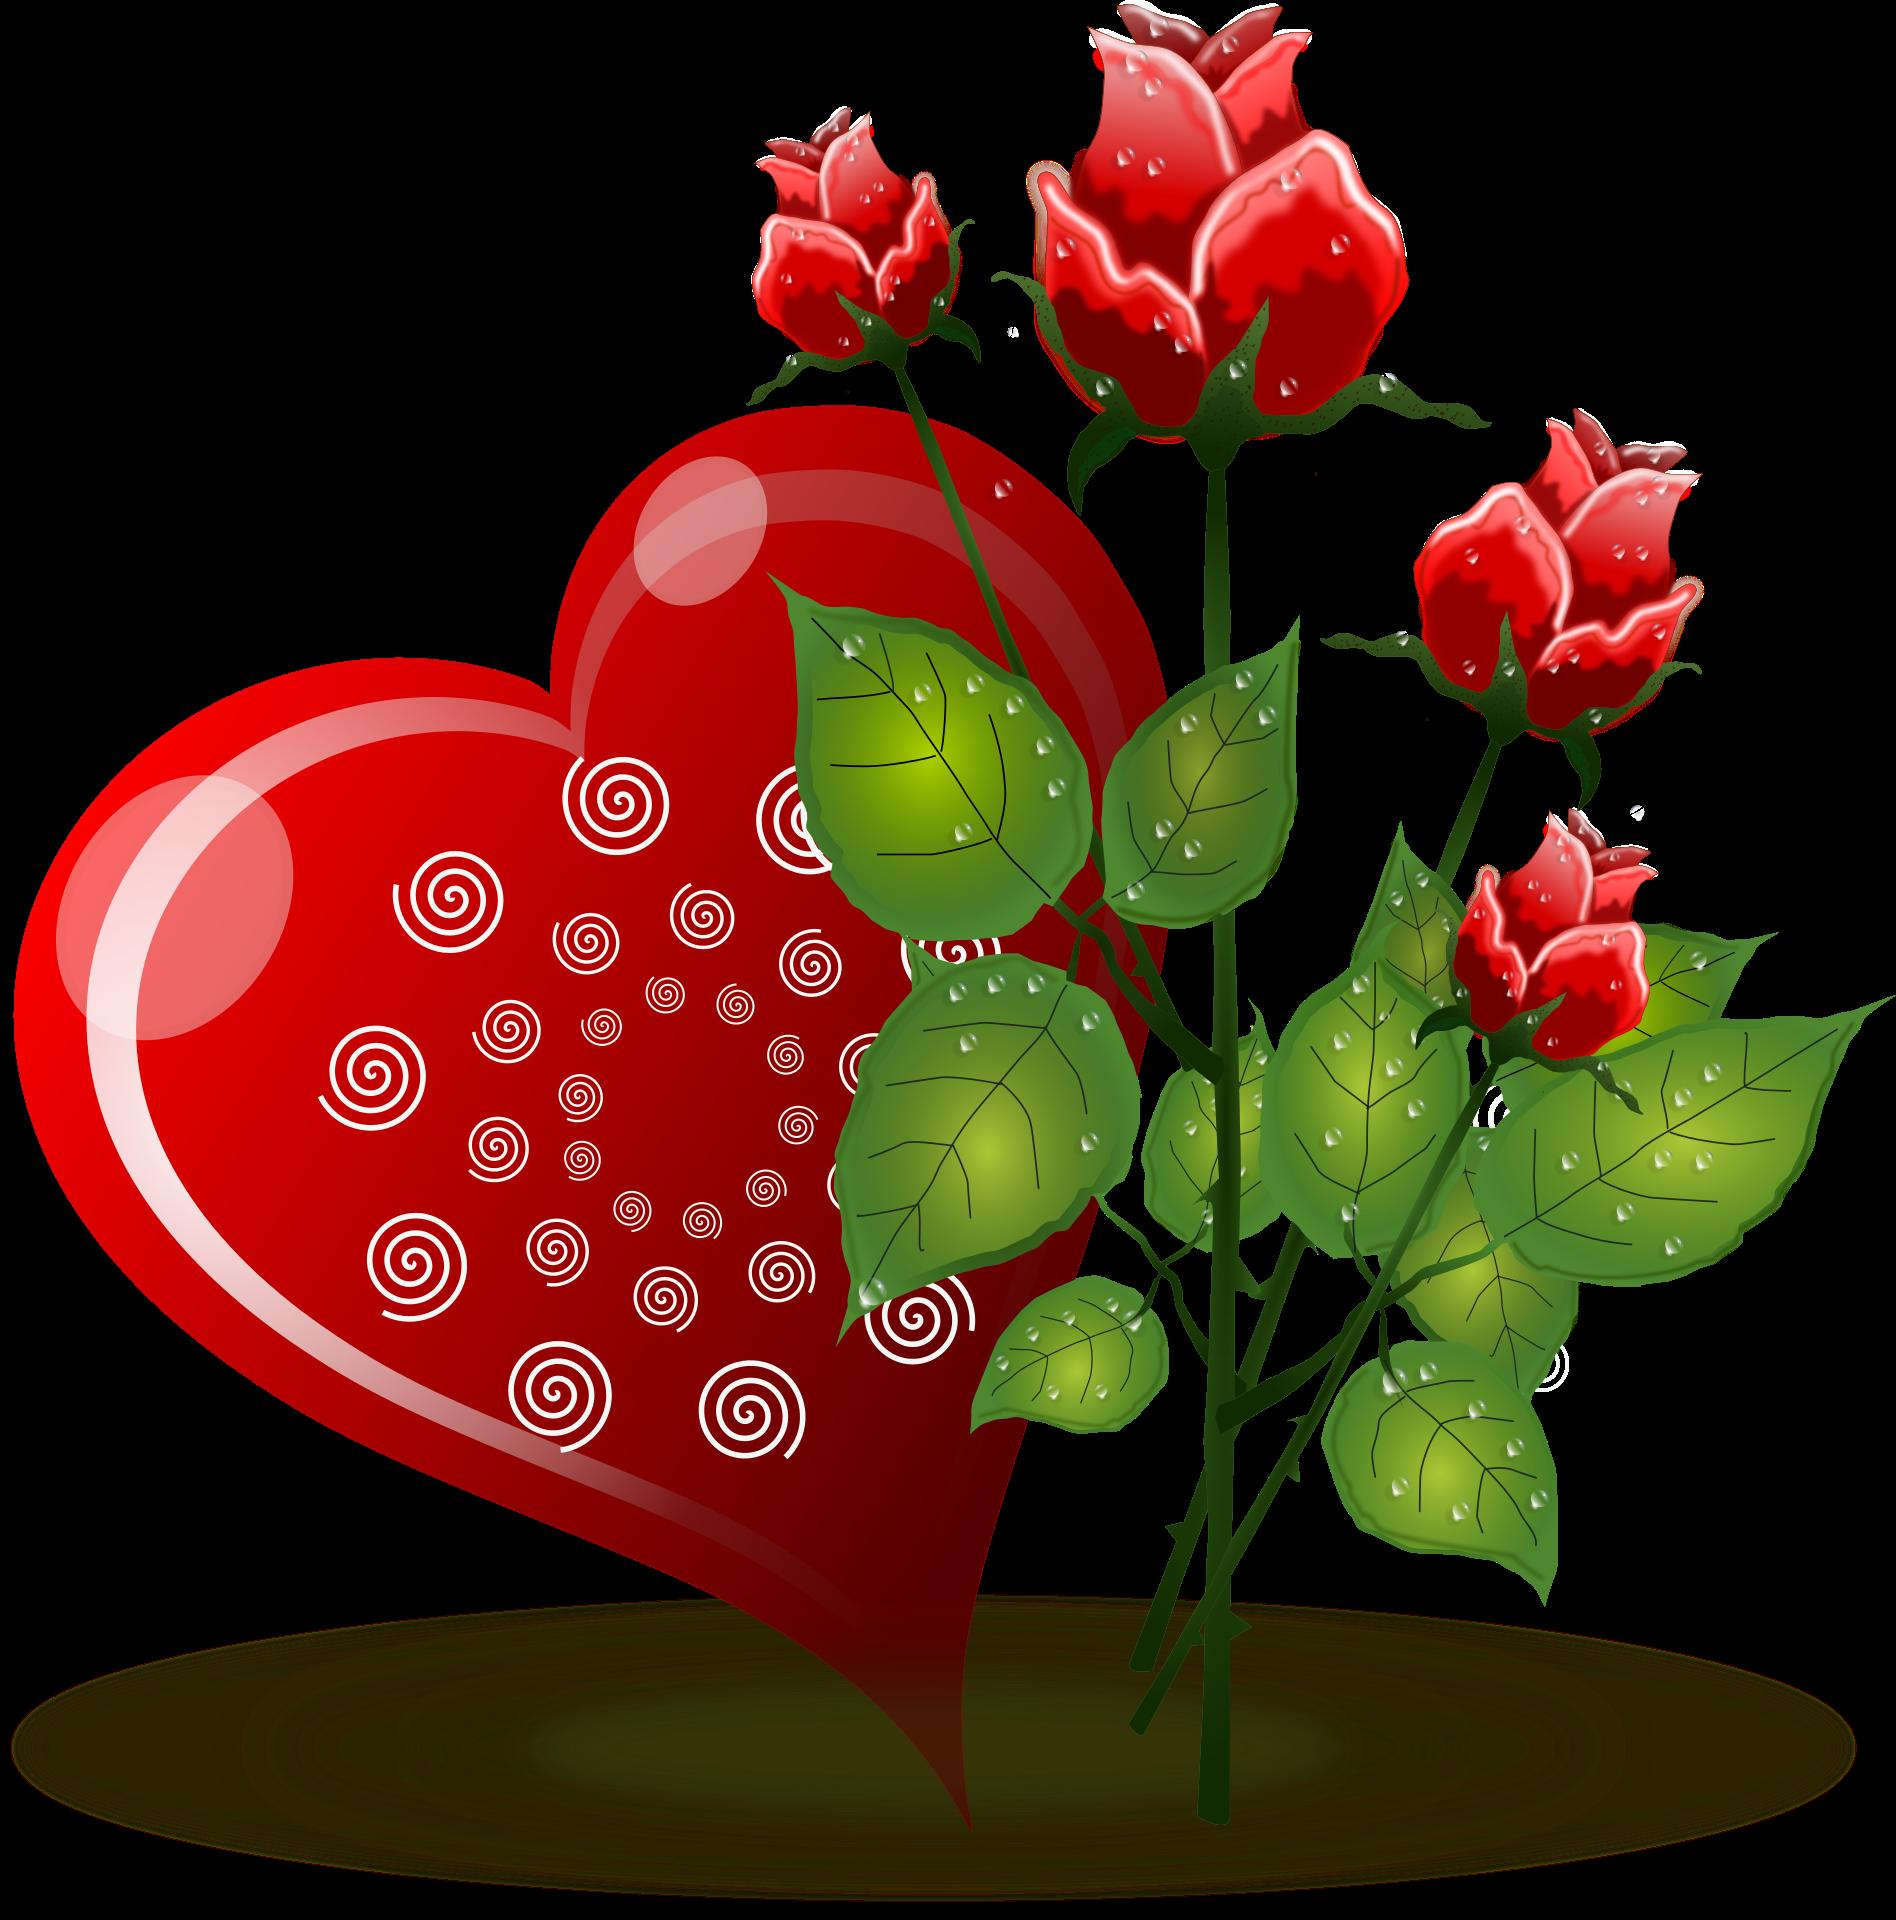 Download heart flower.